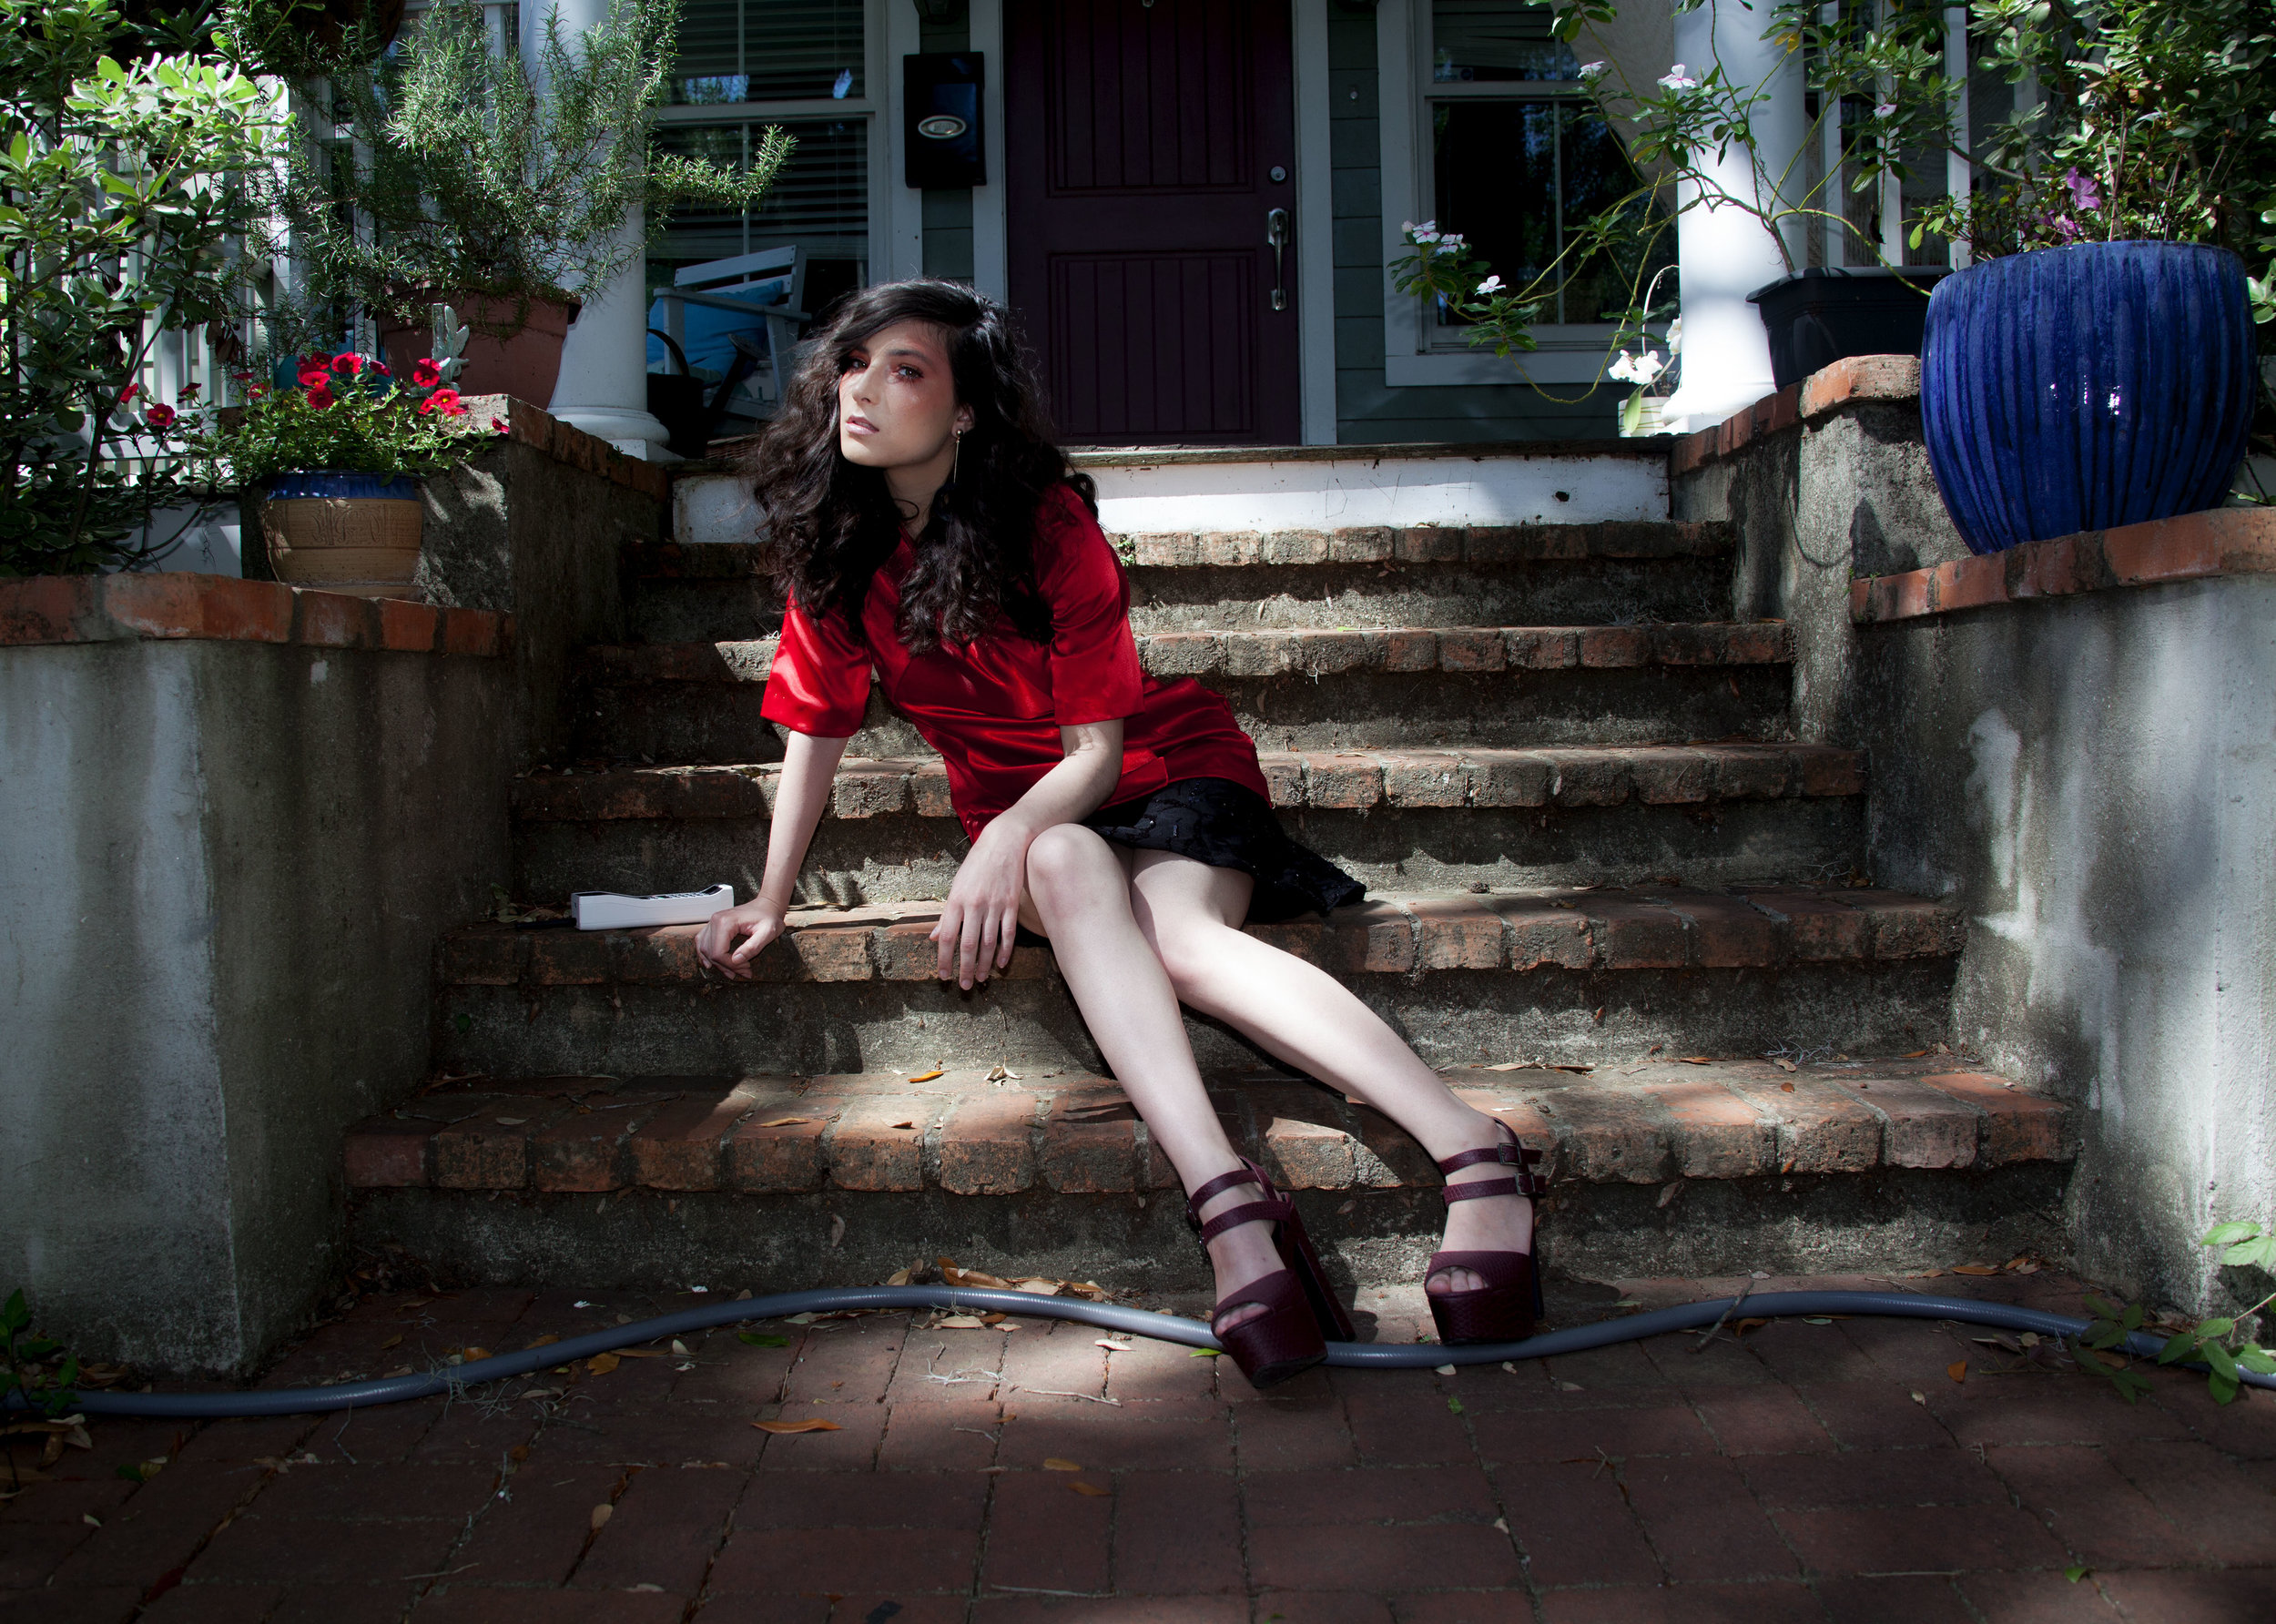 Modeled by Paulina Ramirez, MUA: Art by Evonics, dress: JD Noble, Photo by Ann Van Epps